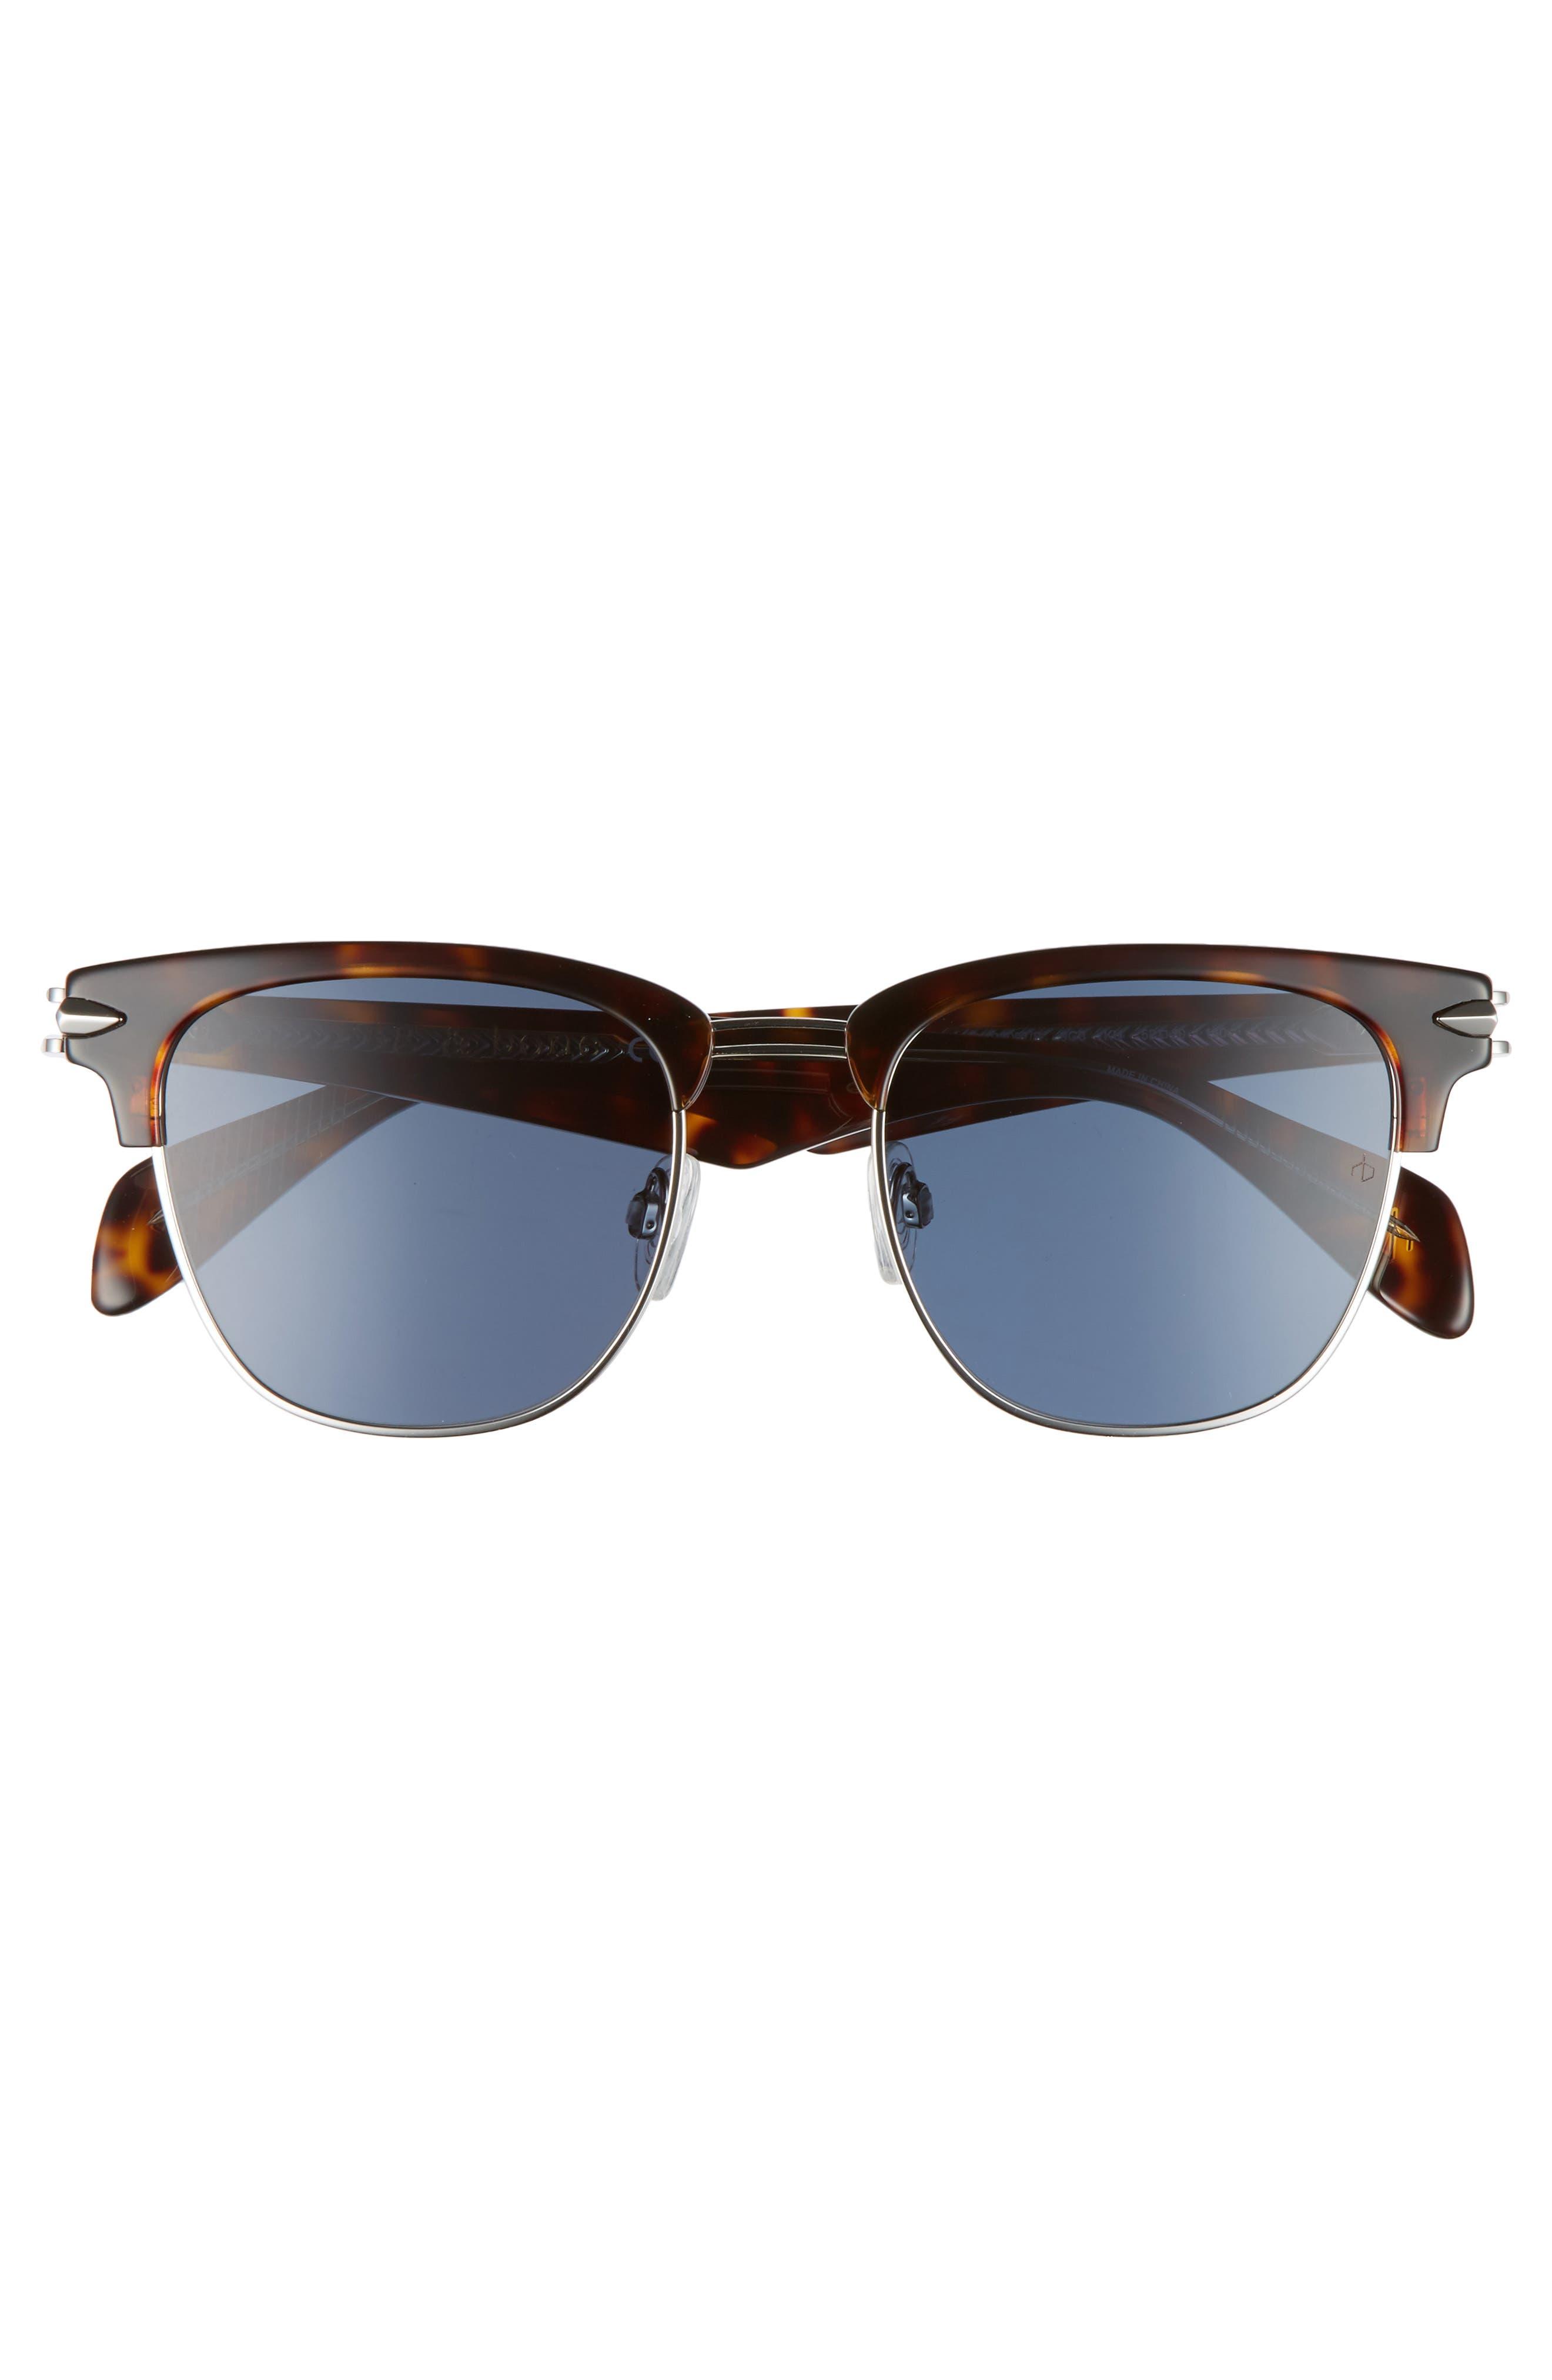 52mm Sunglasses,                             Alternate thumbnail 2, color,                             HAVANA PALLADIUM